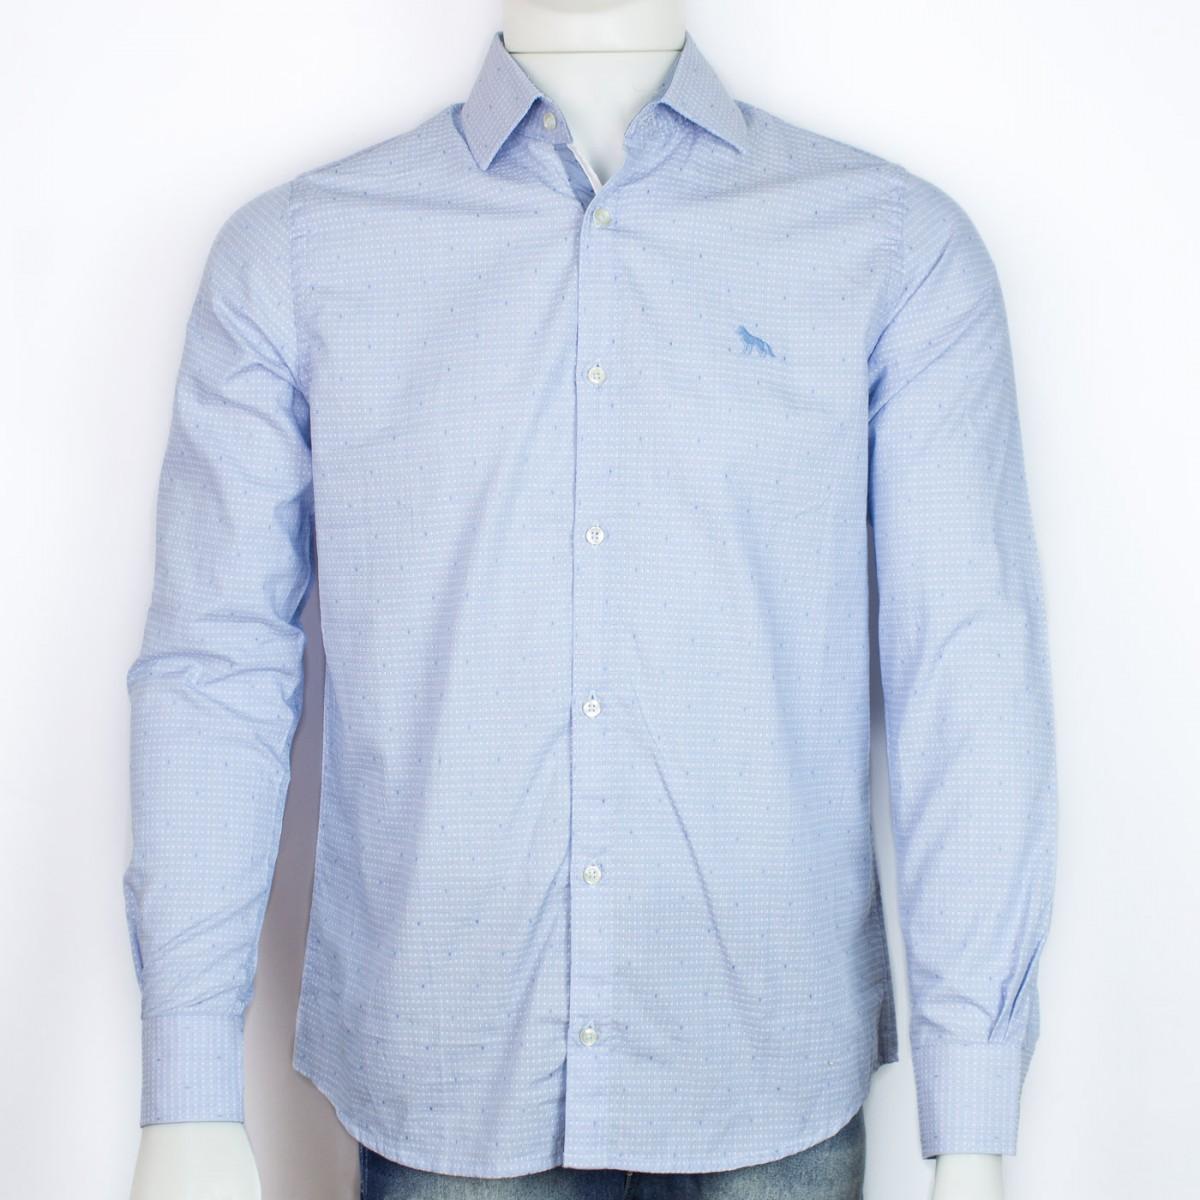 55d89b6e1c7a2 Bizz Store - Camisa Social Masculina Acostamento Manga Longa Azul